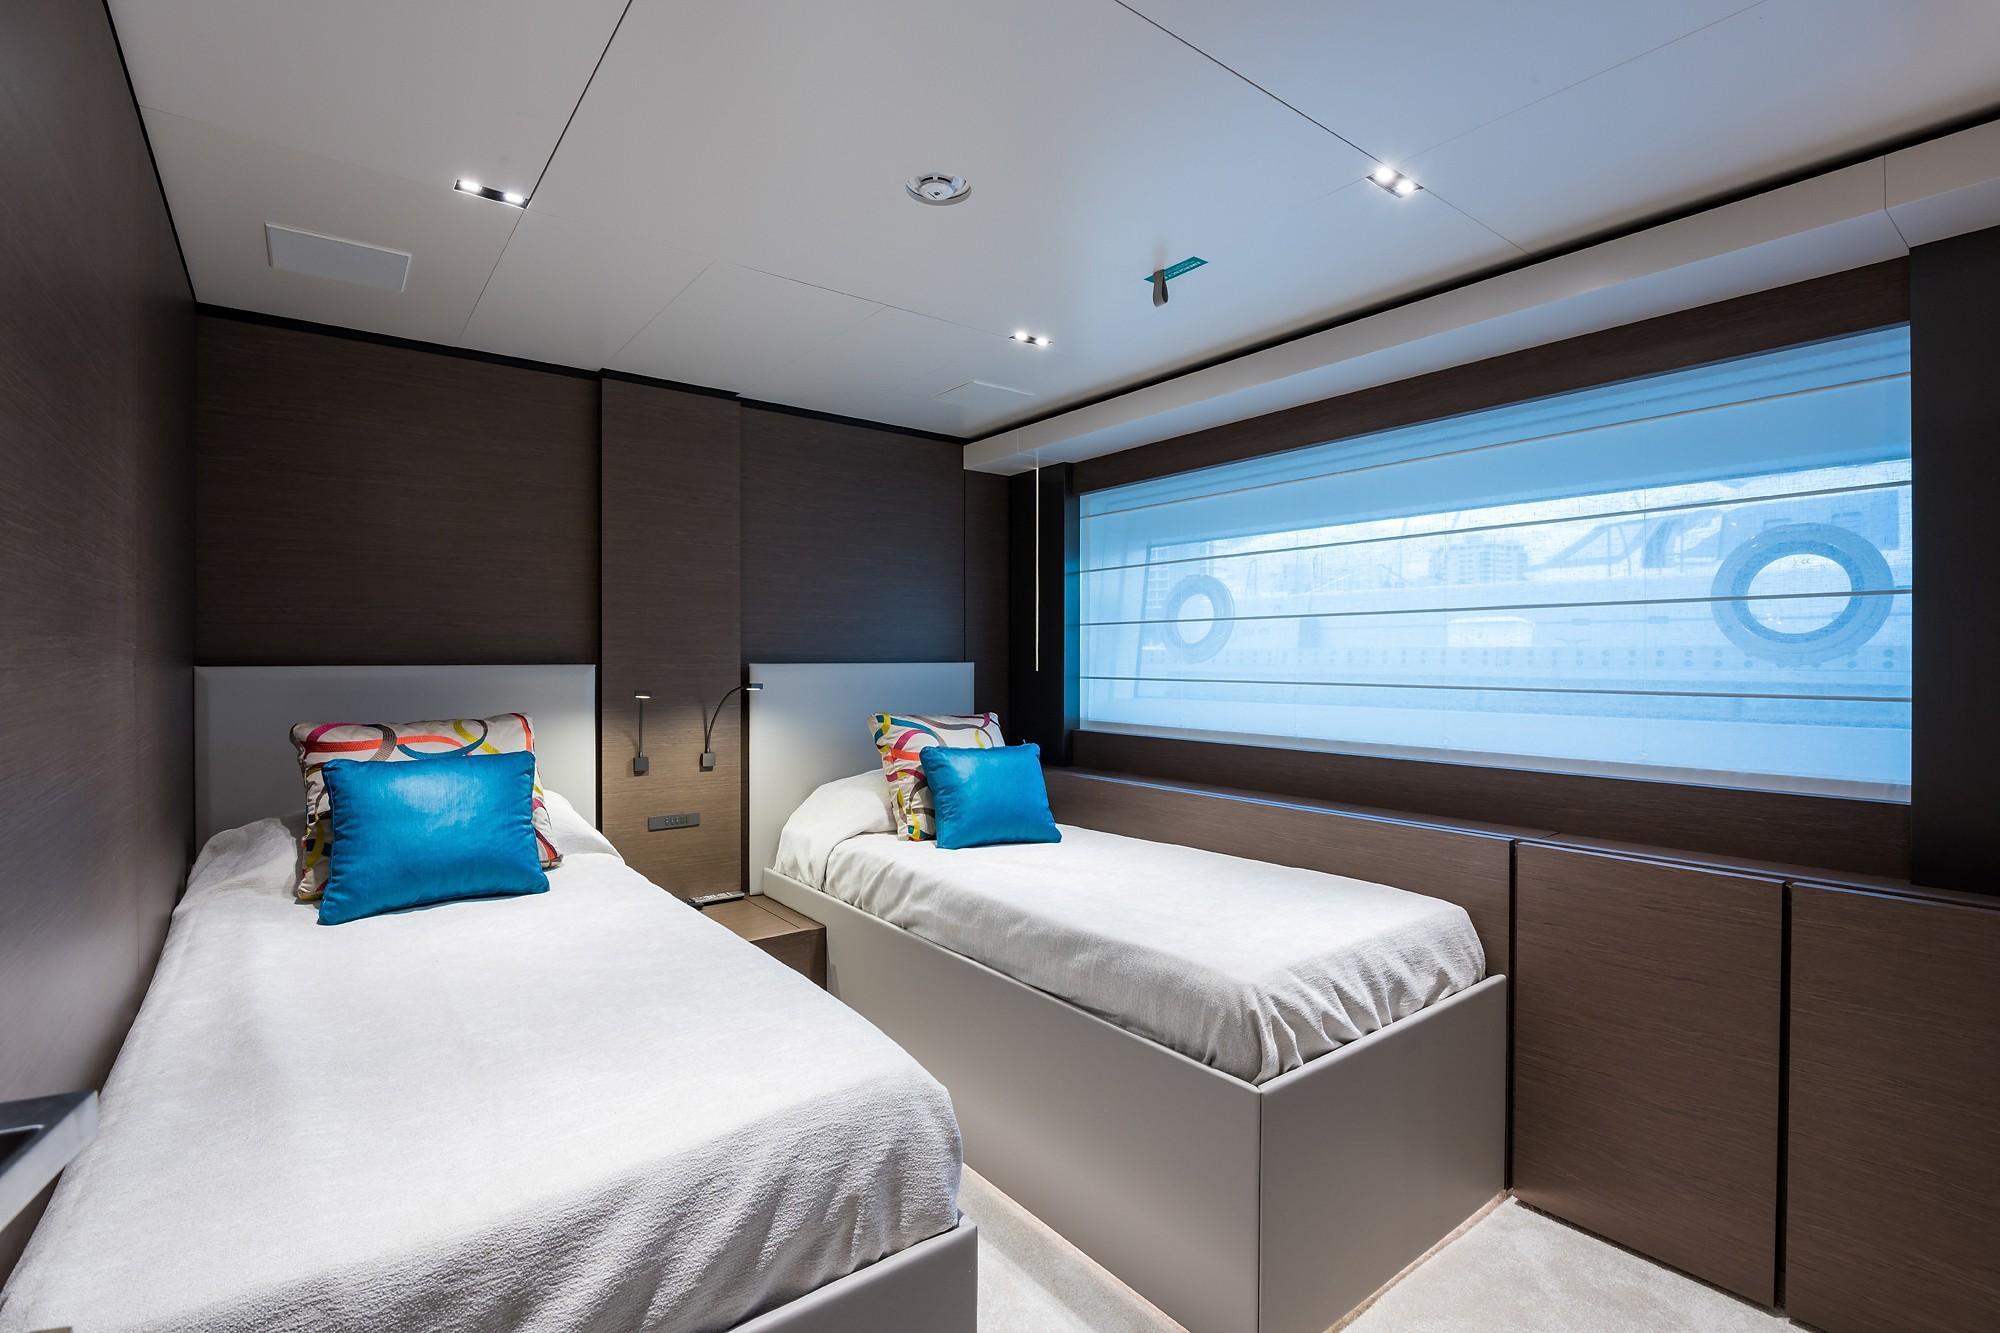 2018 Custom Line Navetta 33 M - Fwd Stbd Guest Cabin